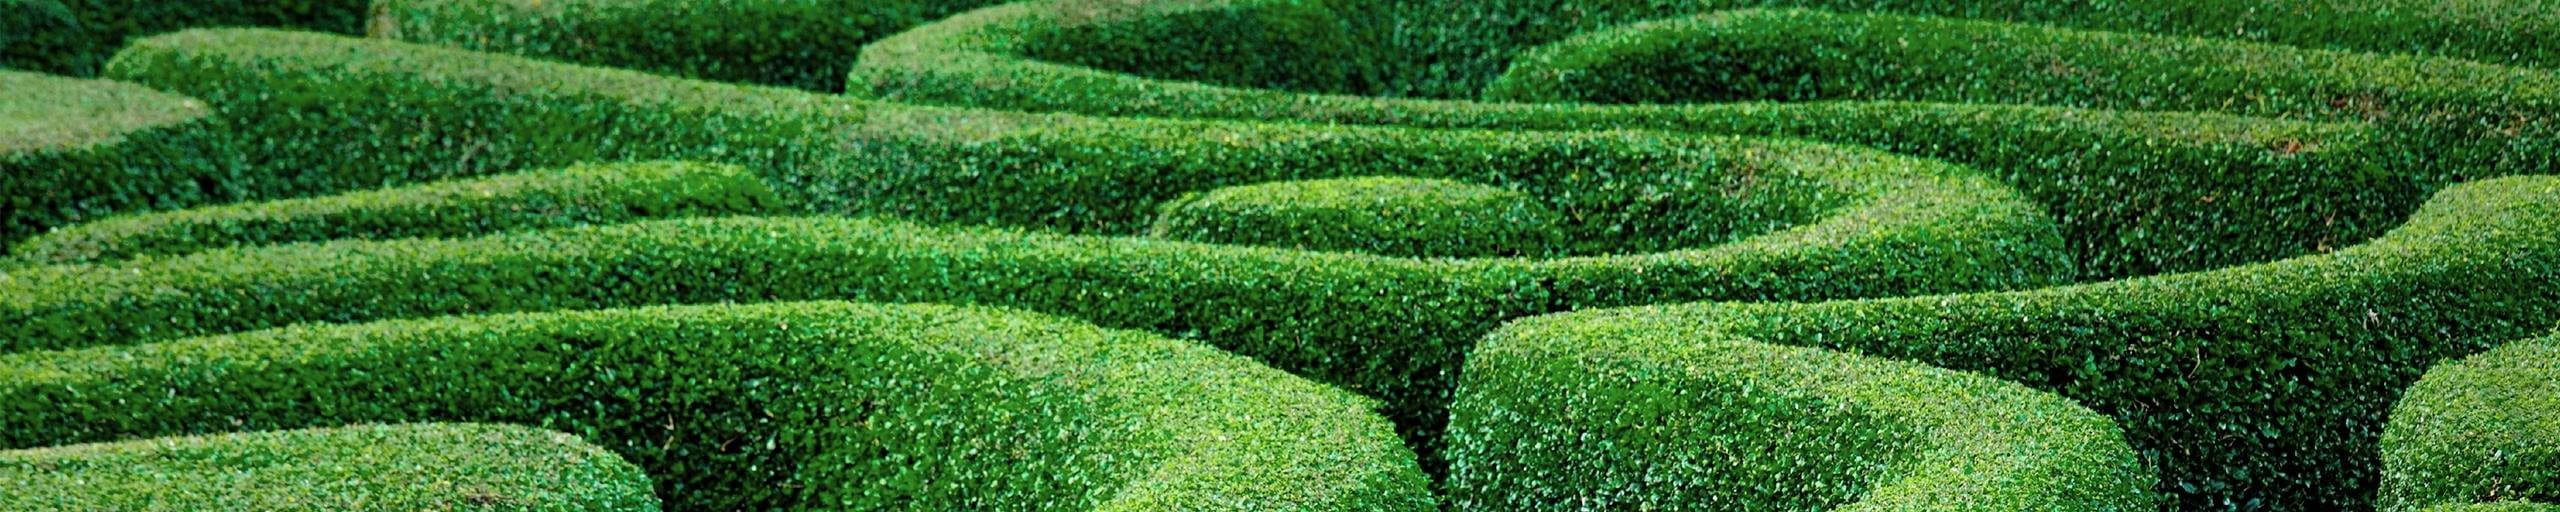 Un labyrinthe.